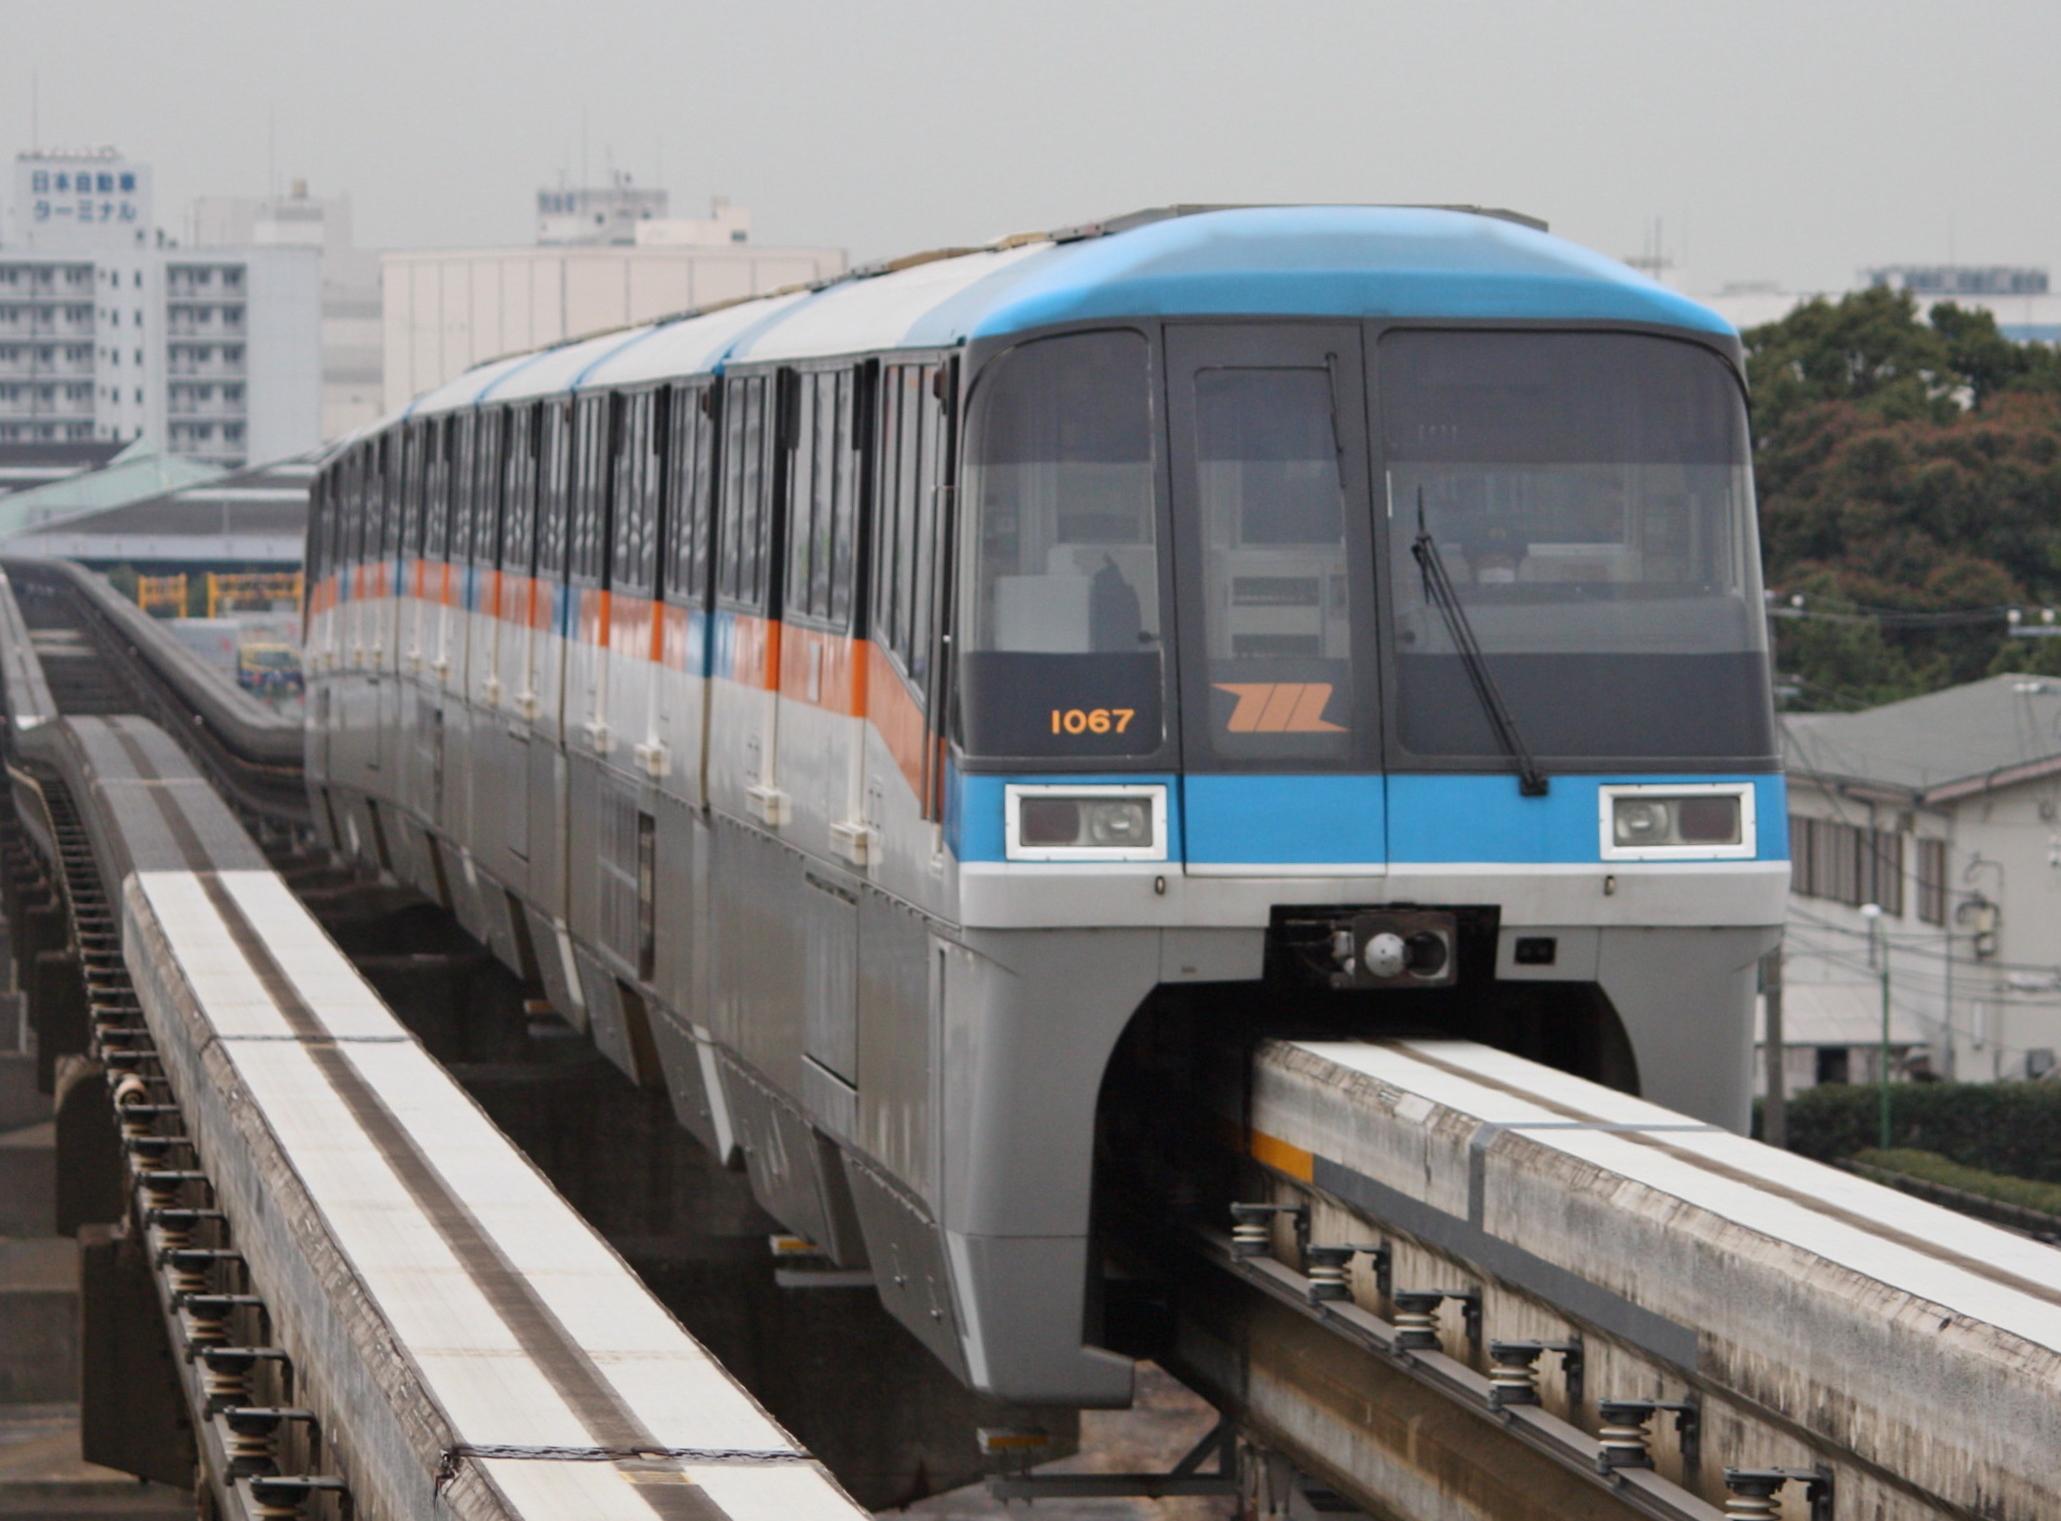 File:Tokyo monorail 1000-1067.jpg